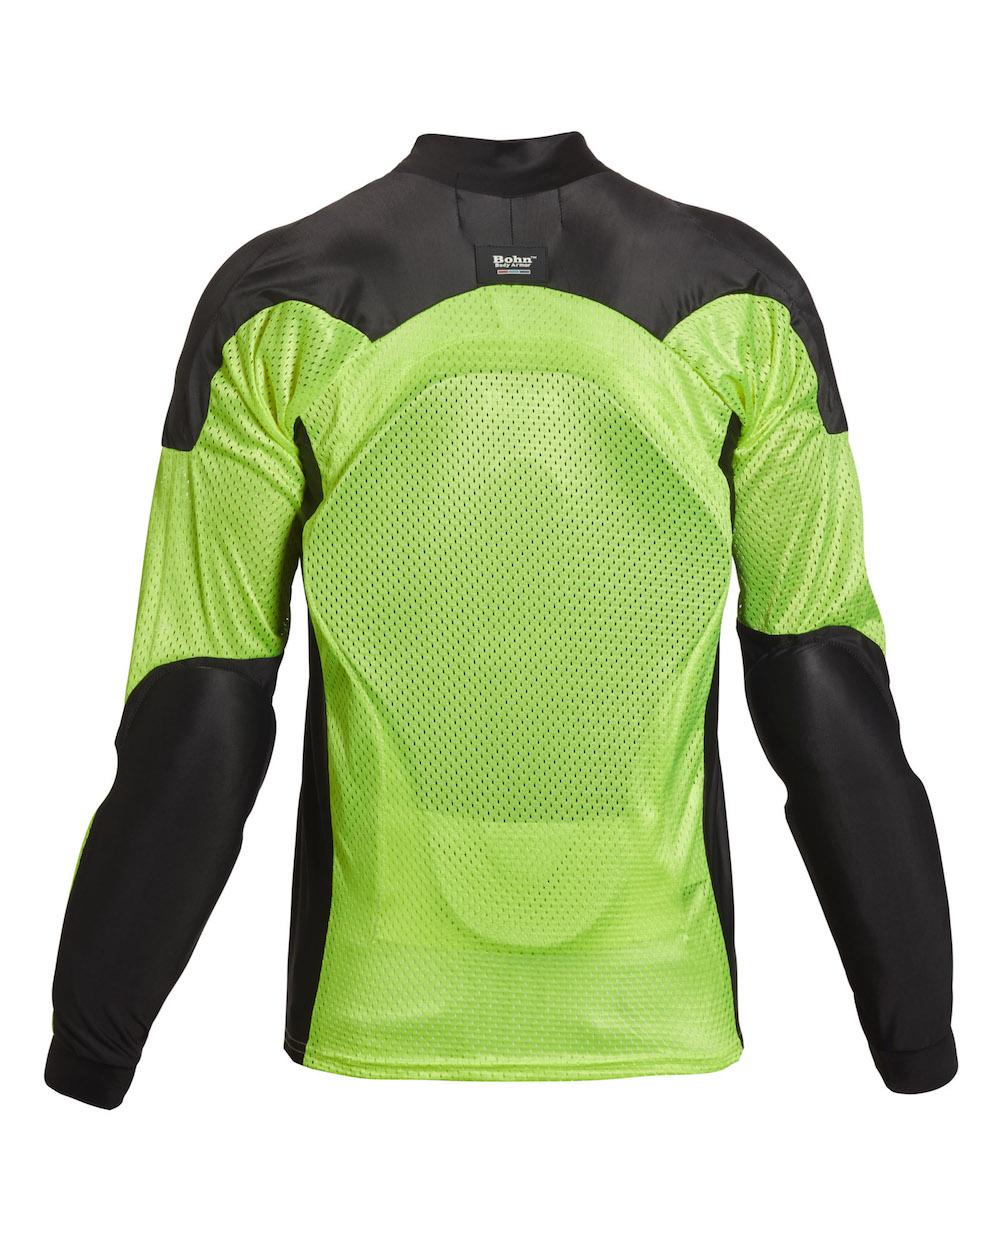 98bdf9e5f88b Bohn Body Armor All Season Airtex Motorcycle Shirt High-Visibility  Yellow-Back